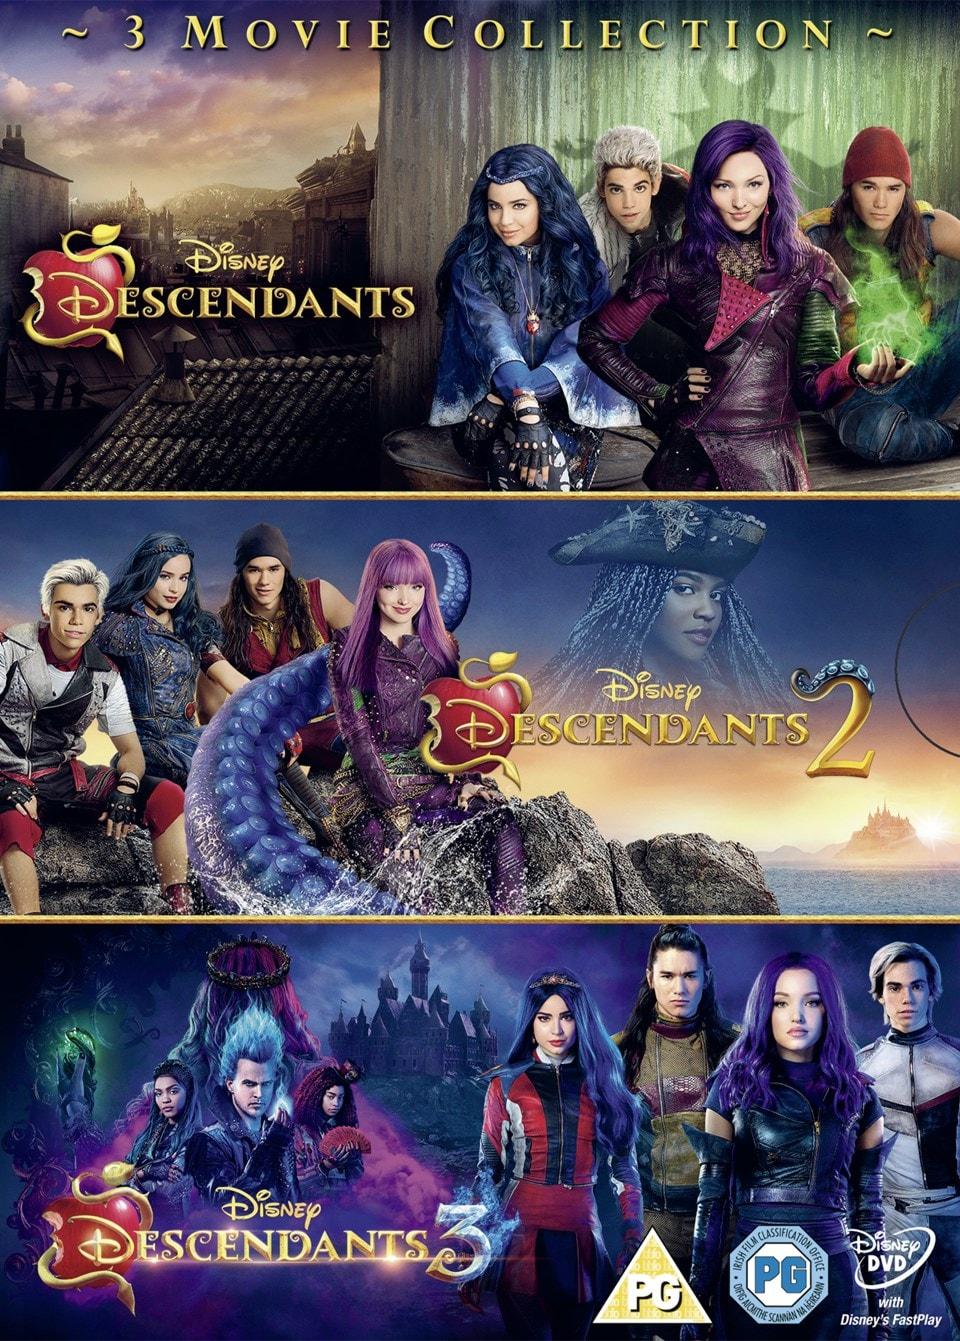 Descendants: 3-movie Collection - 1